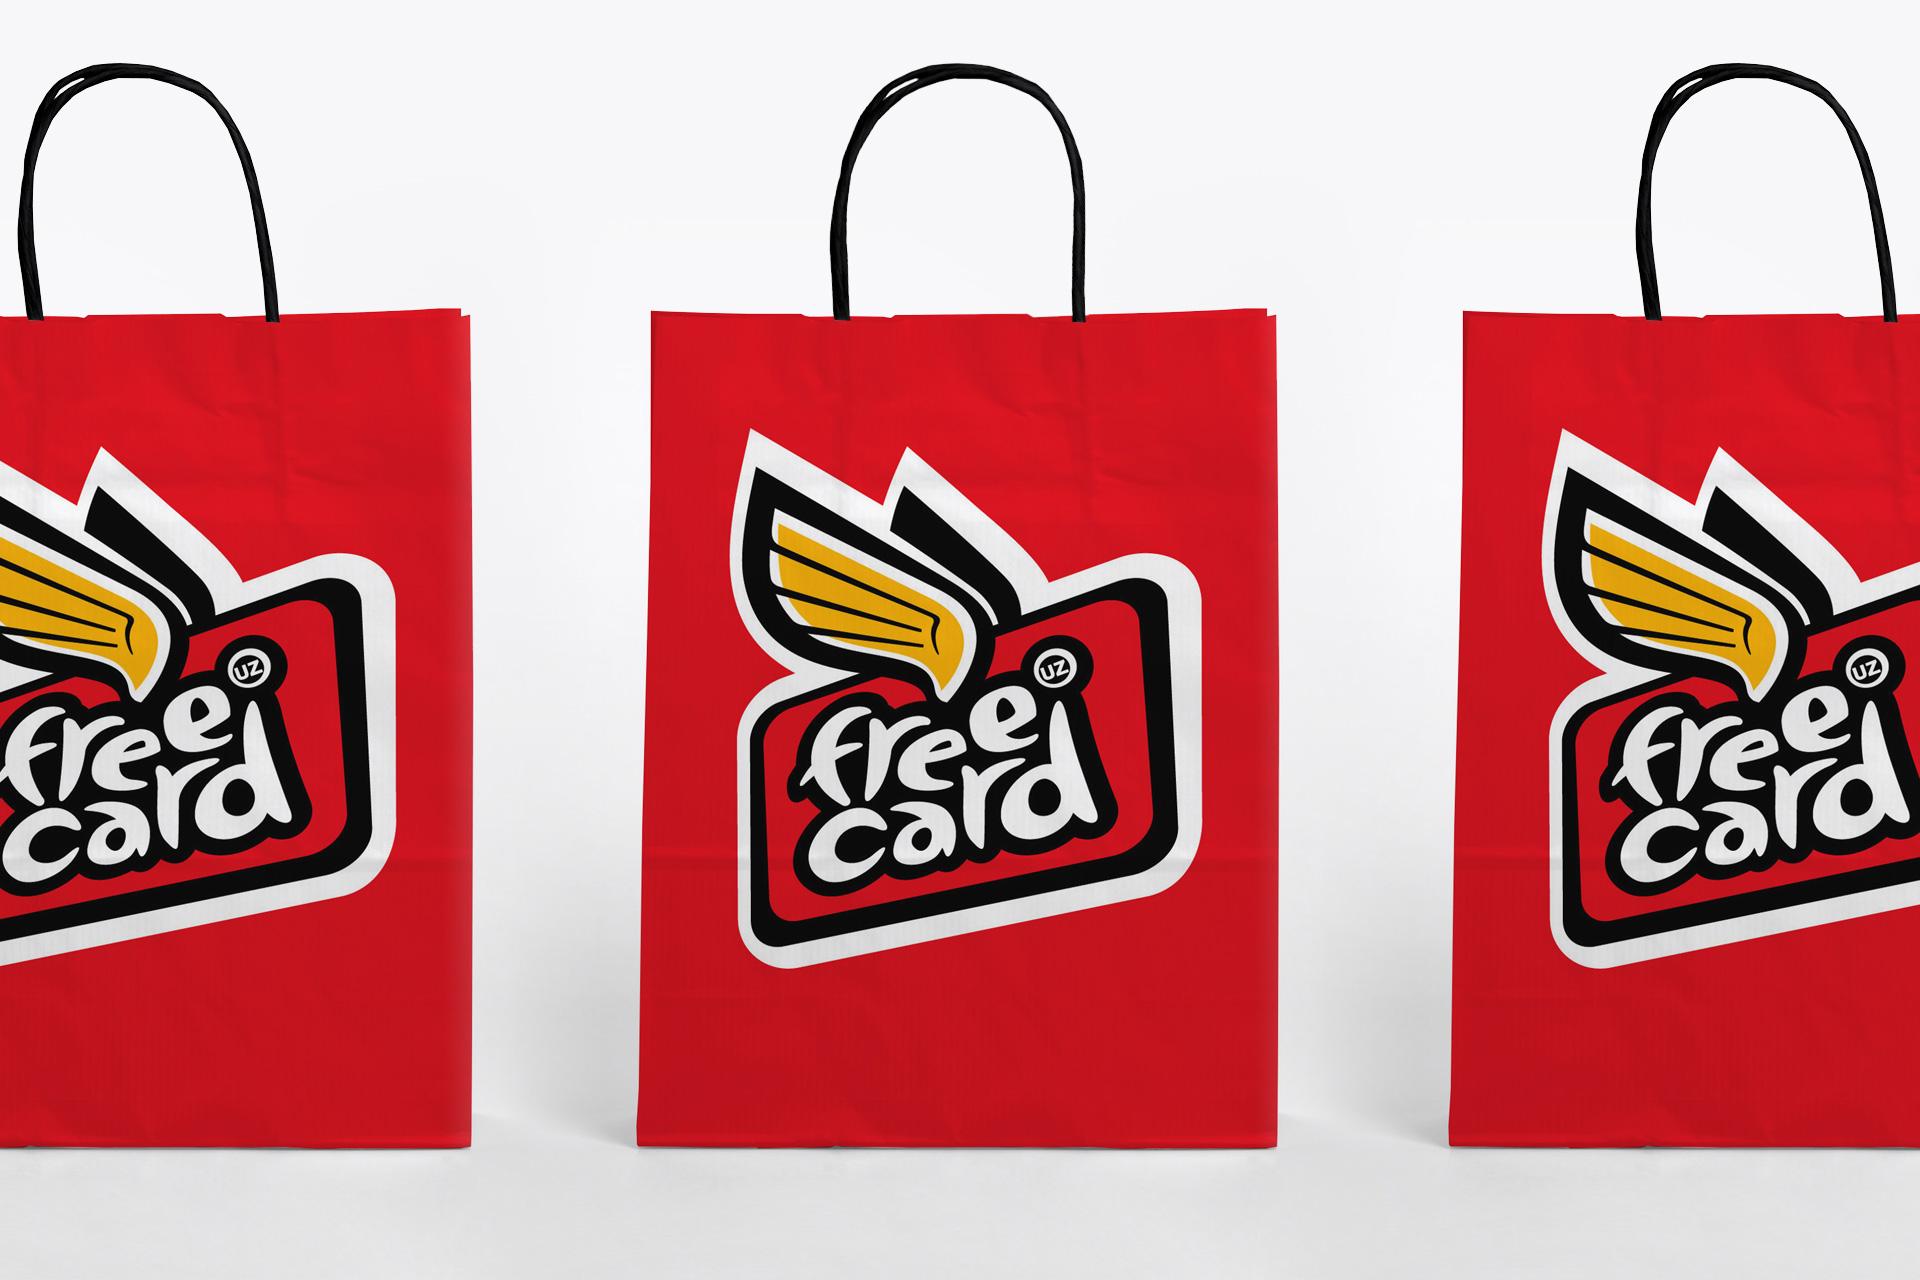 Asgard Branding, corporate identity, branding, Free Card, logo, packaging design, advertising agency